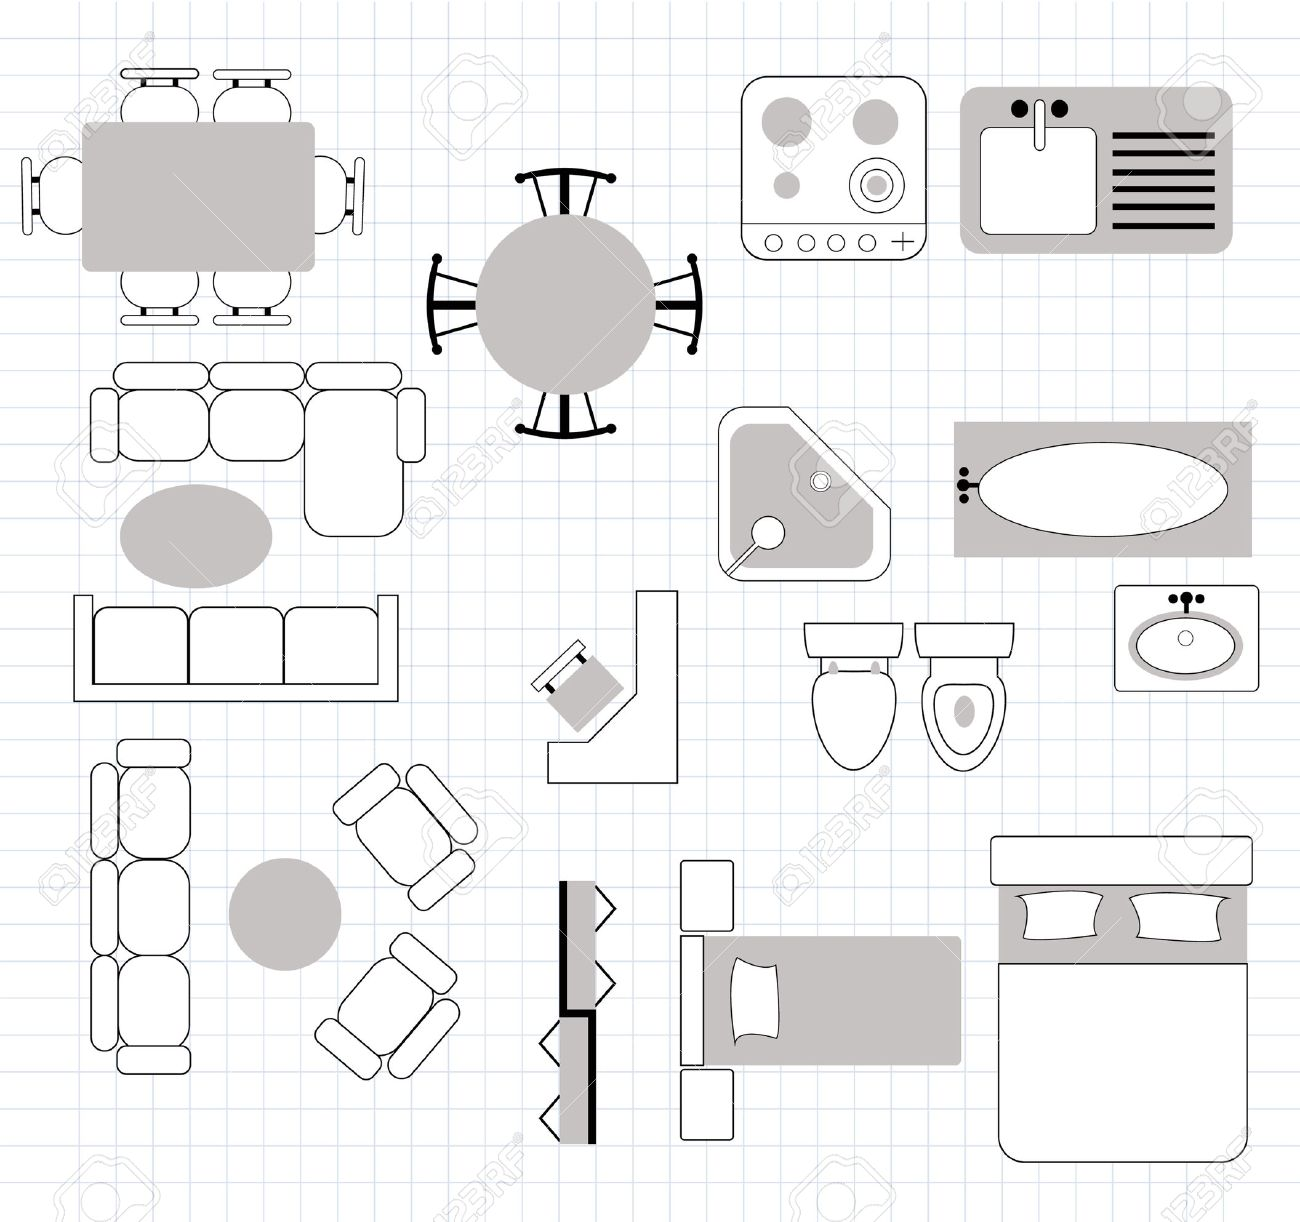 floor plan with furniture - 26161160